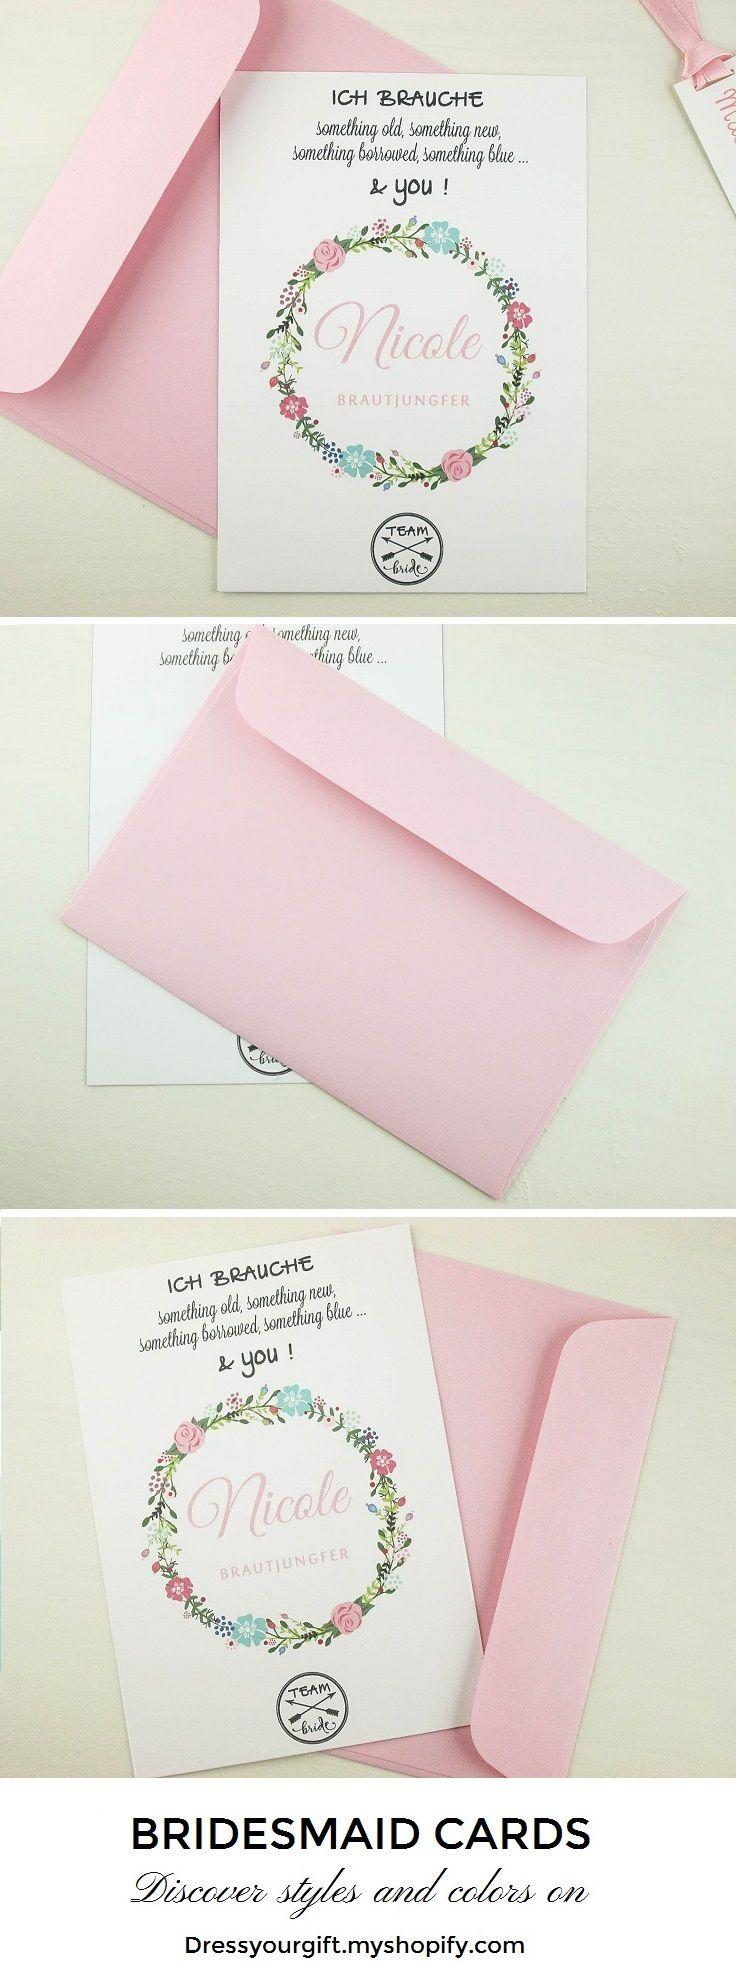 Personalized bridesmaid card and envelope, pink bridal shower invitation #bridalshowerinvitation #brautjungfern #demoiselledhonneur #damadehonor#trauzeugin